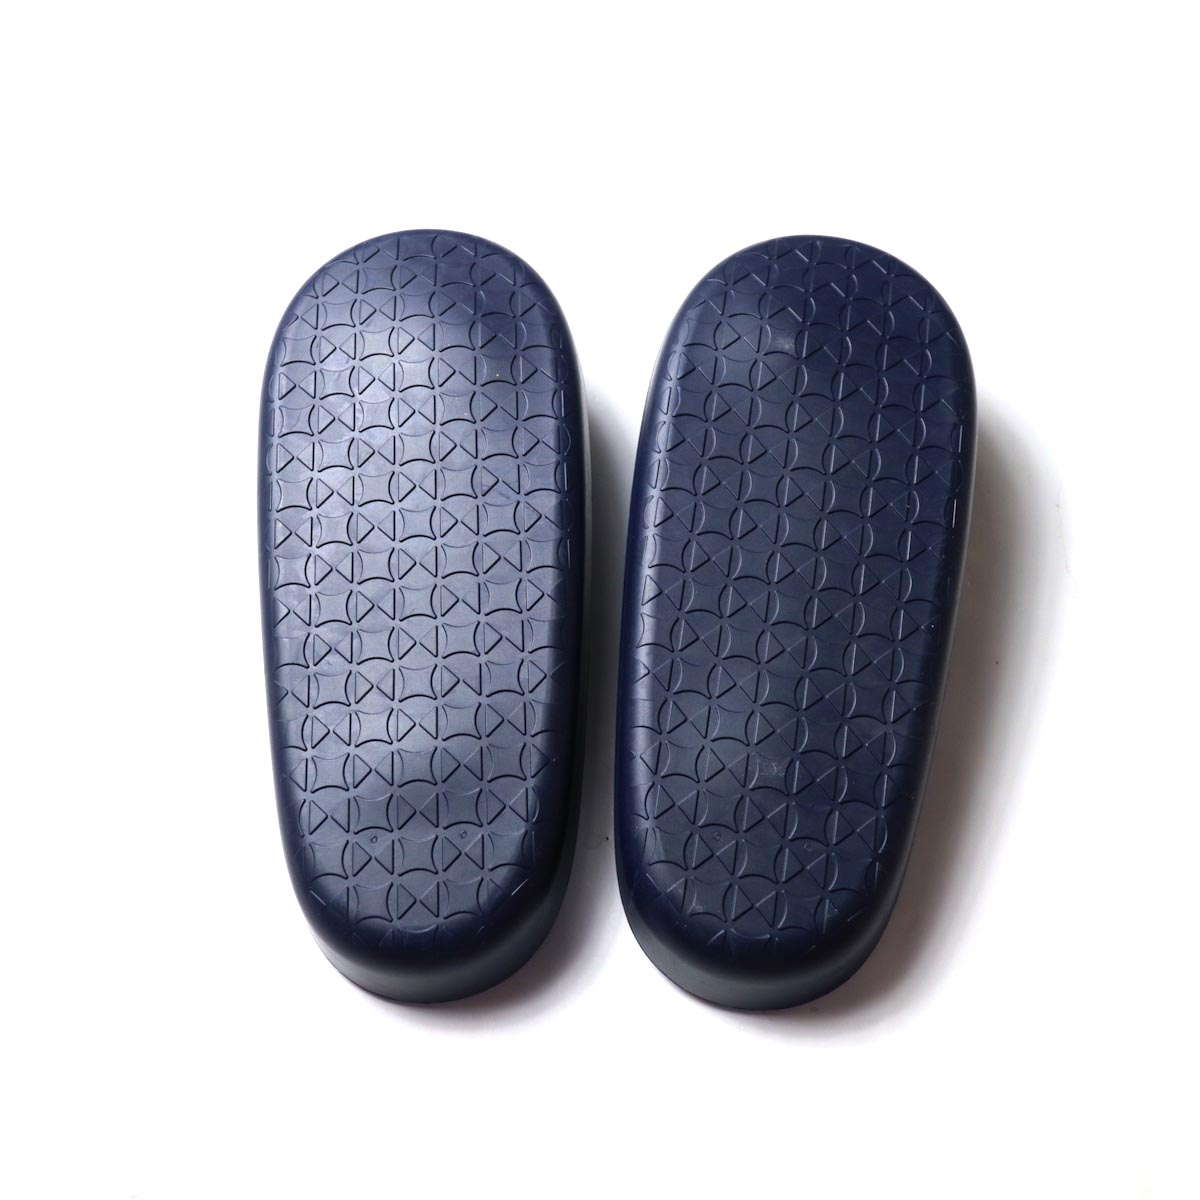 JOJO / Beach Sandal -Black (細鼻緒 / Navy Suede)アウトソール